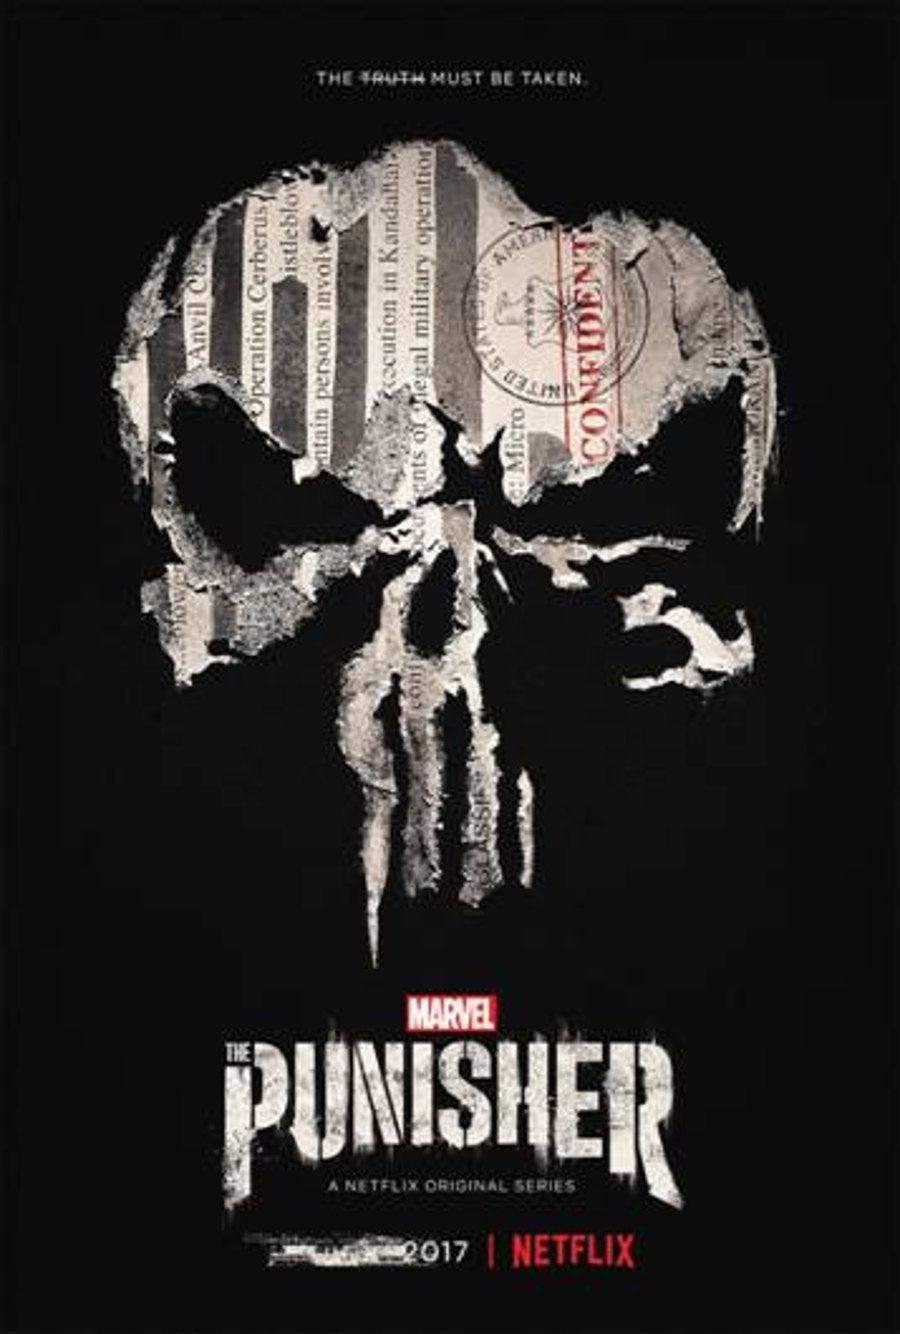 The Punisher key art